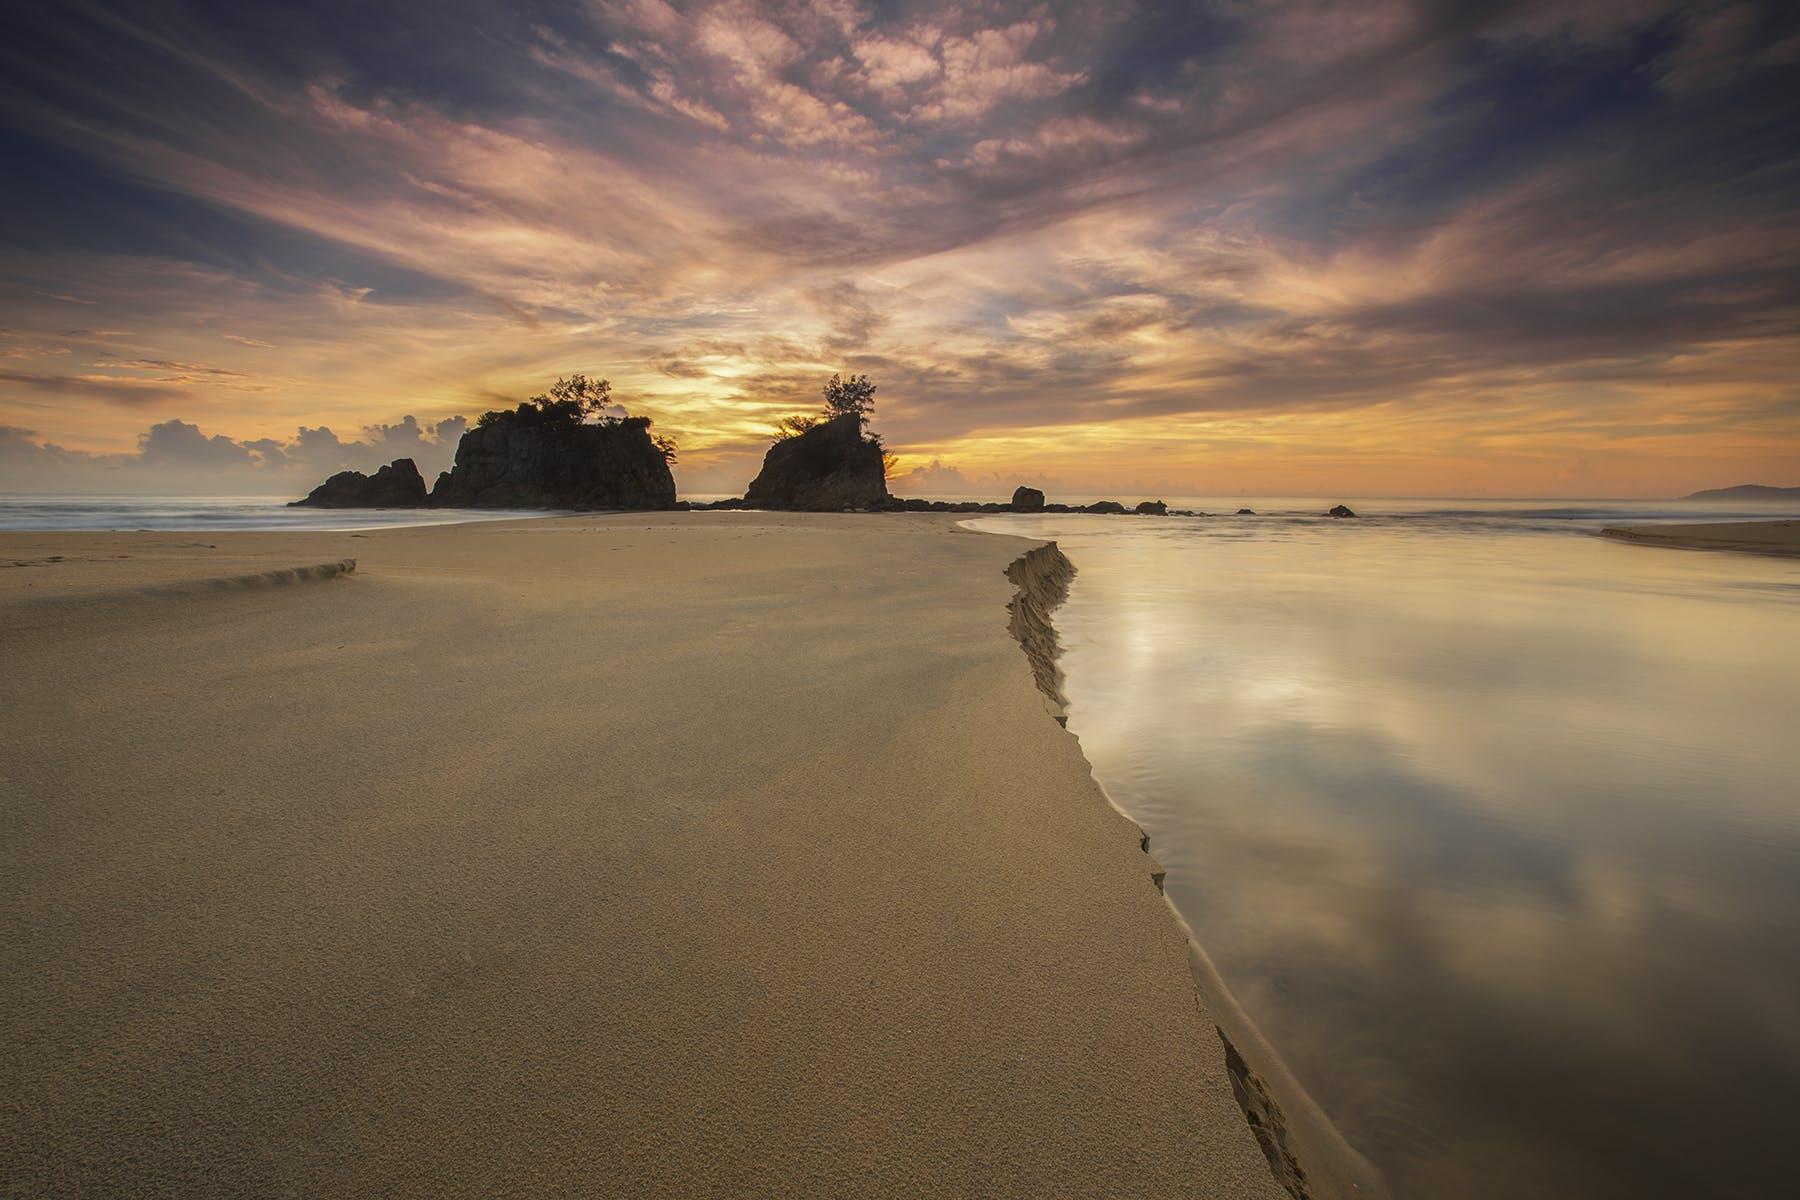 Panoramic Photo of Bay and White Sand during Daytime